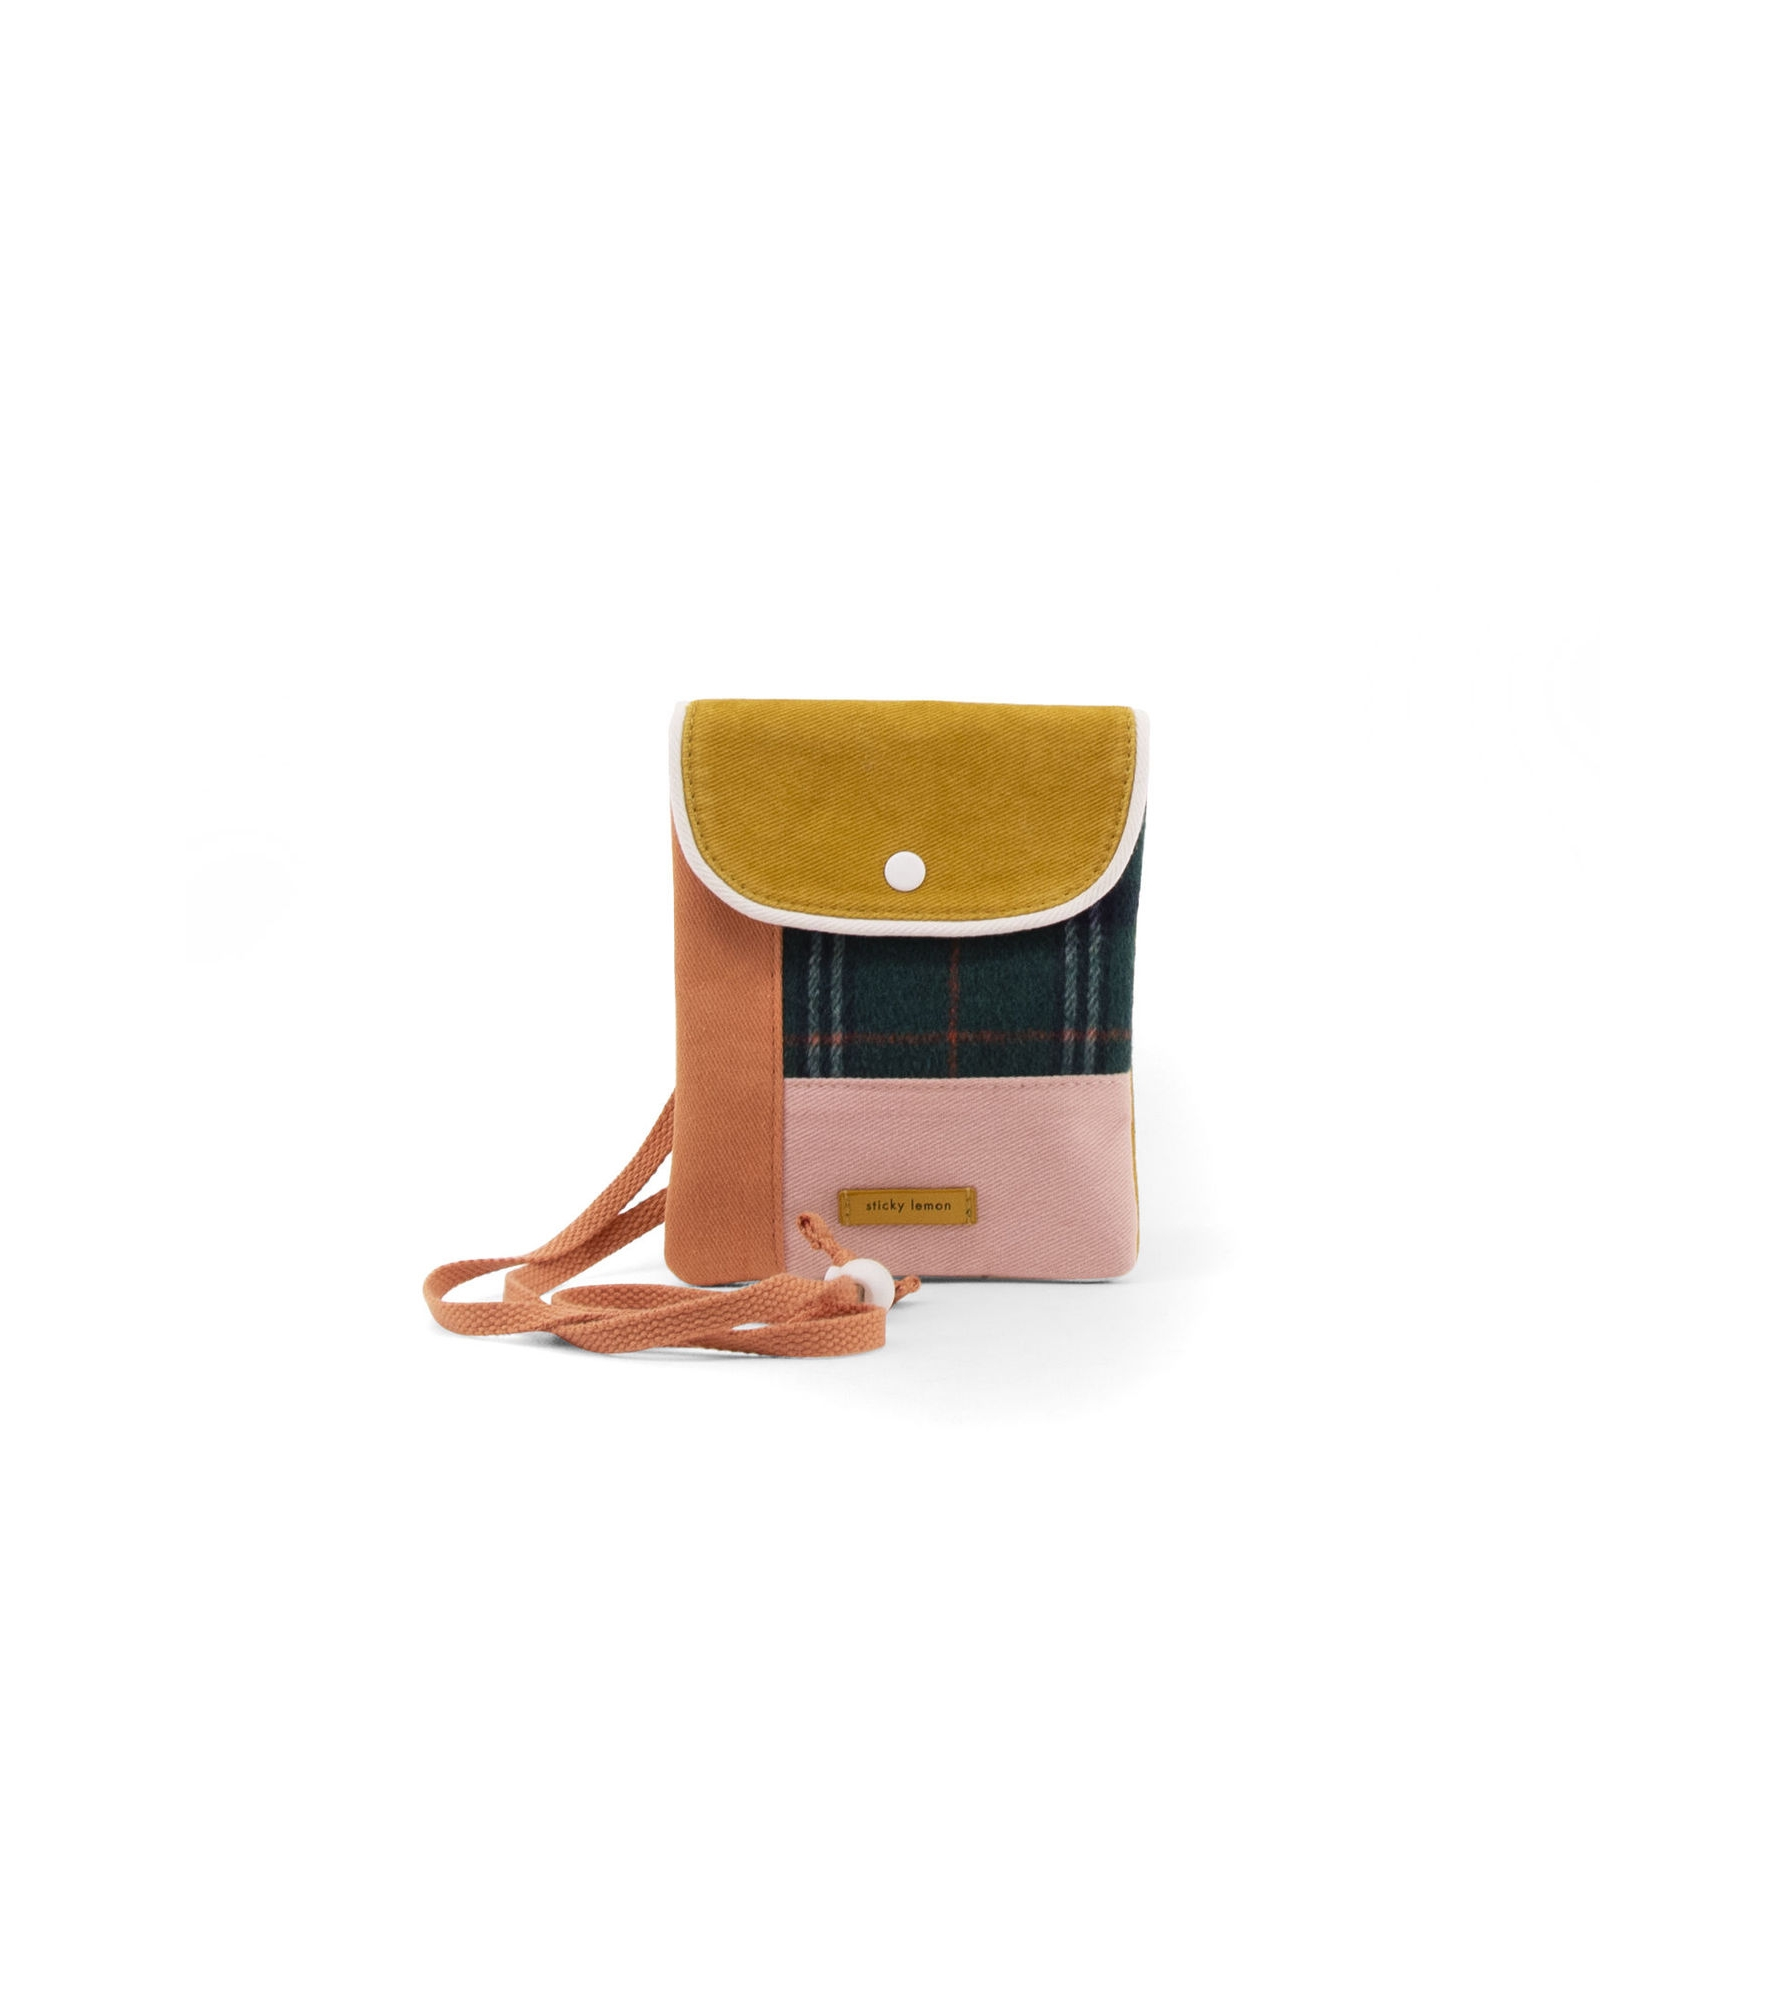 1801678_–_Sticky_Lemon_-_wanderer_-_wallet_bag_-_forest_green_-_front.jpg